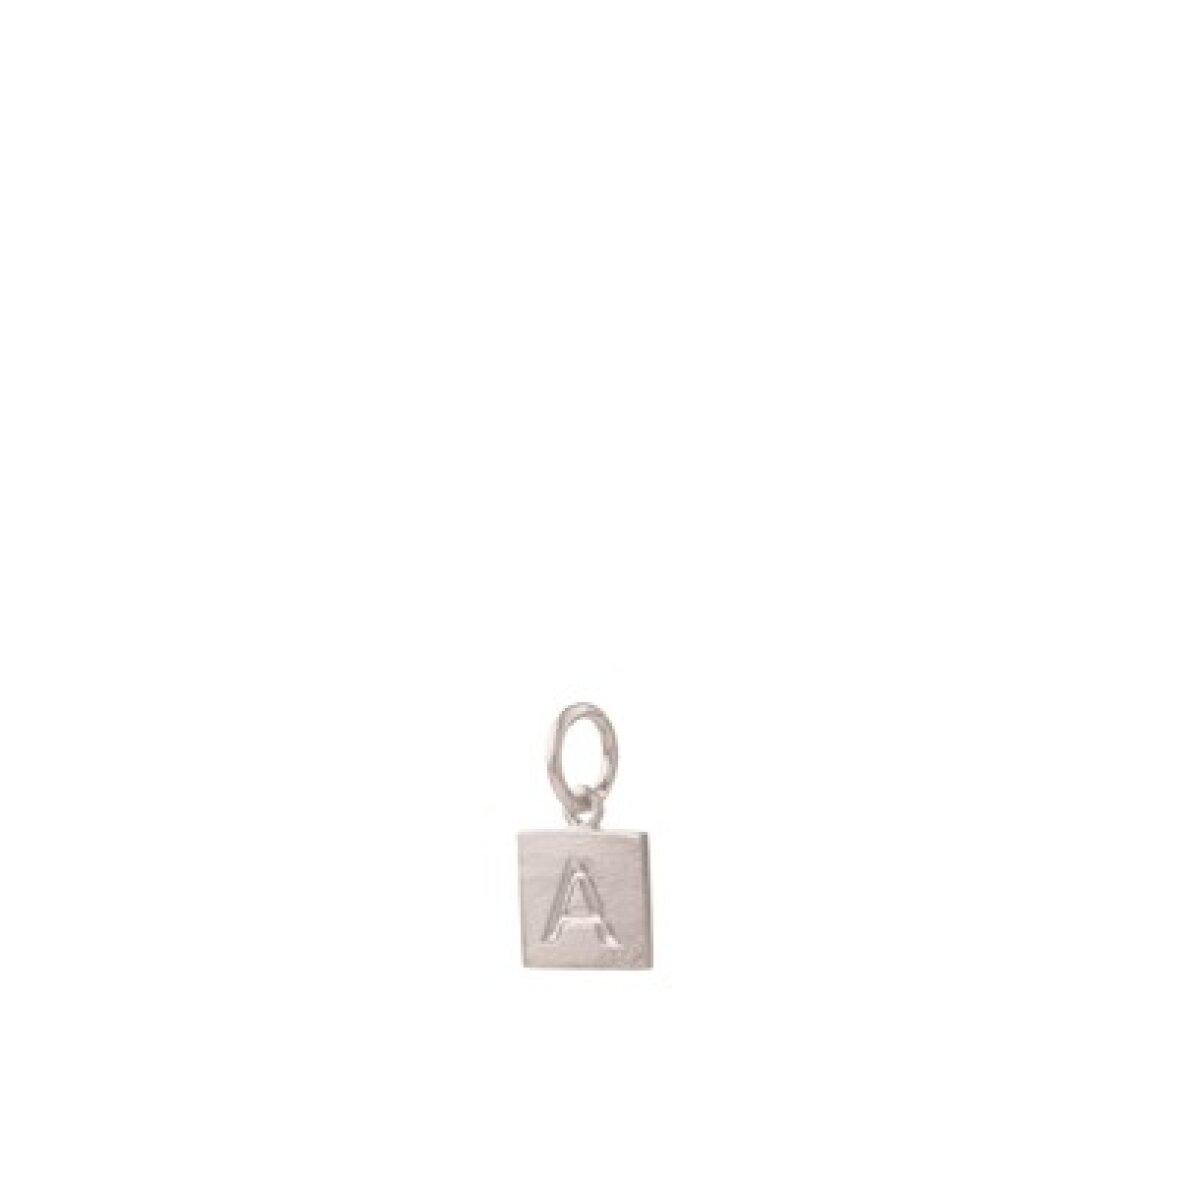 7a571c373fb SMYKKER/URE - PERNILLE CORYDON - LETTER SQUARE, ALL LETTERS